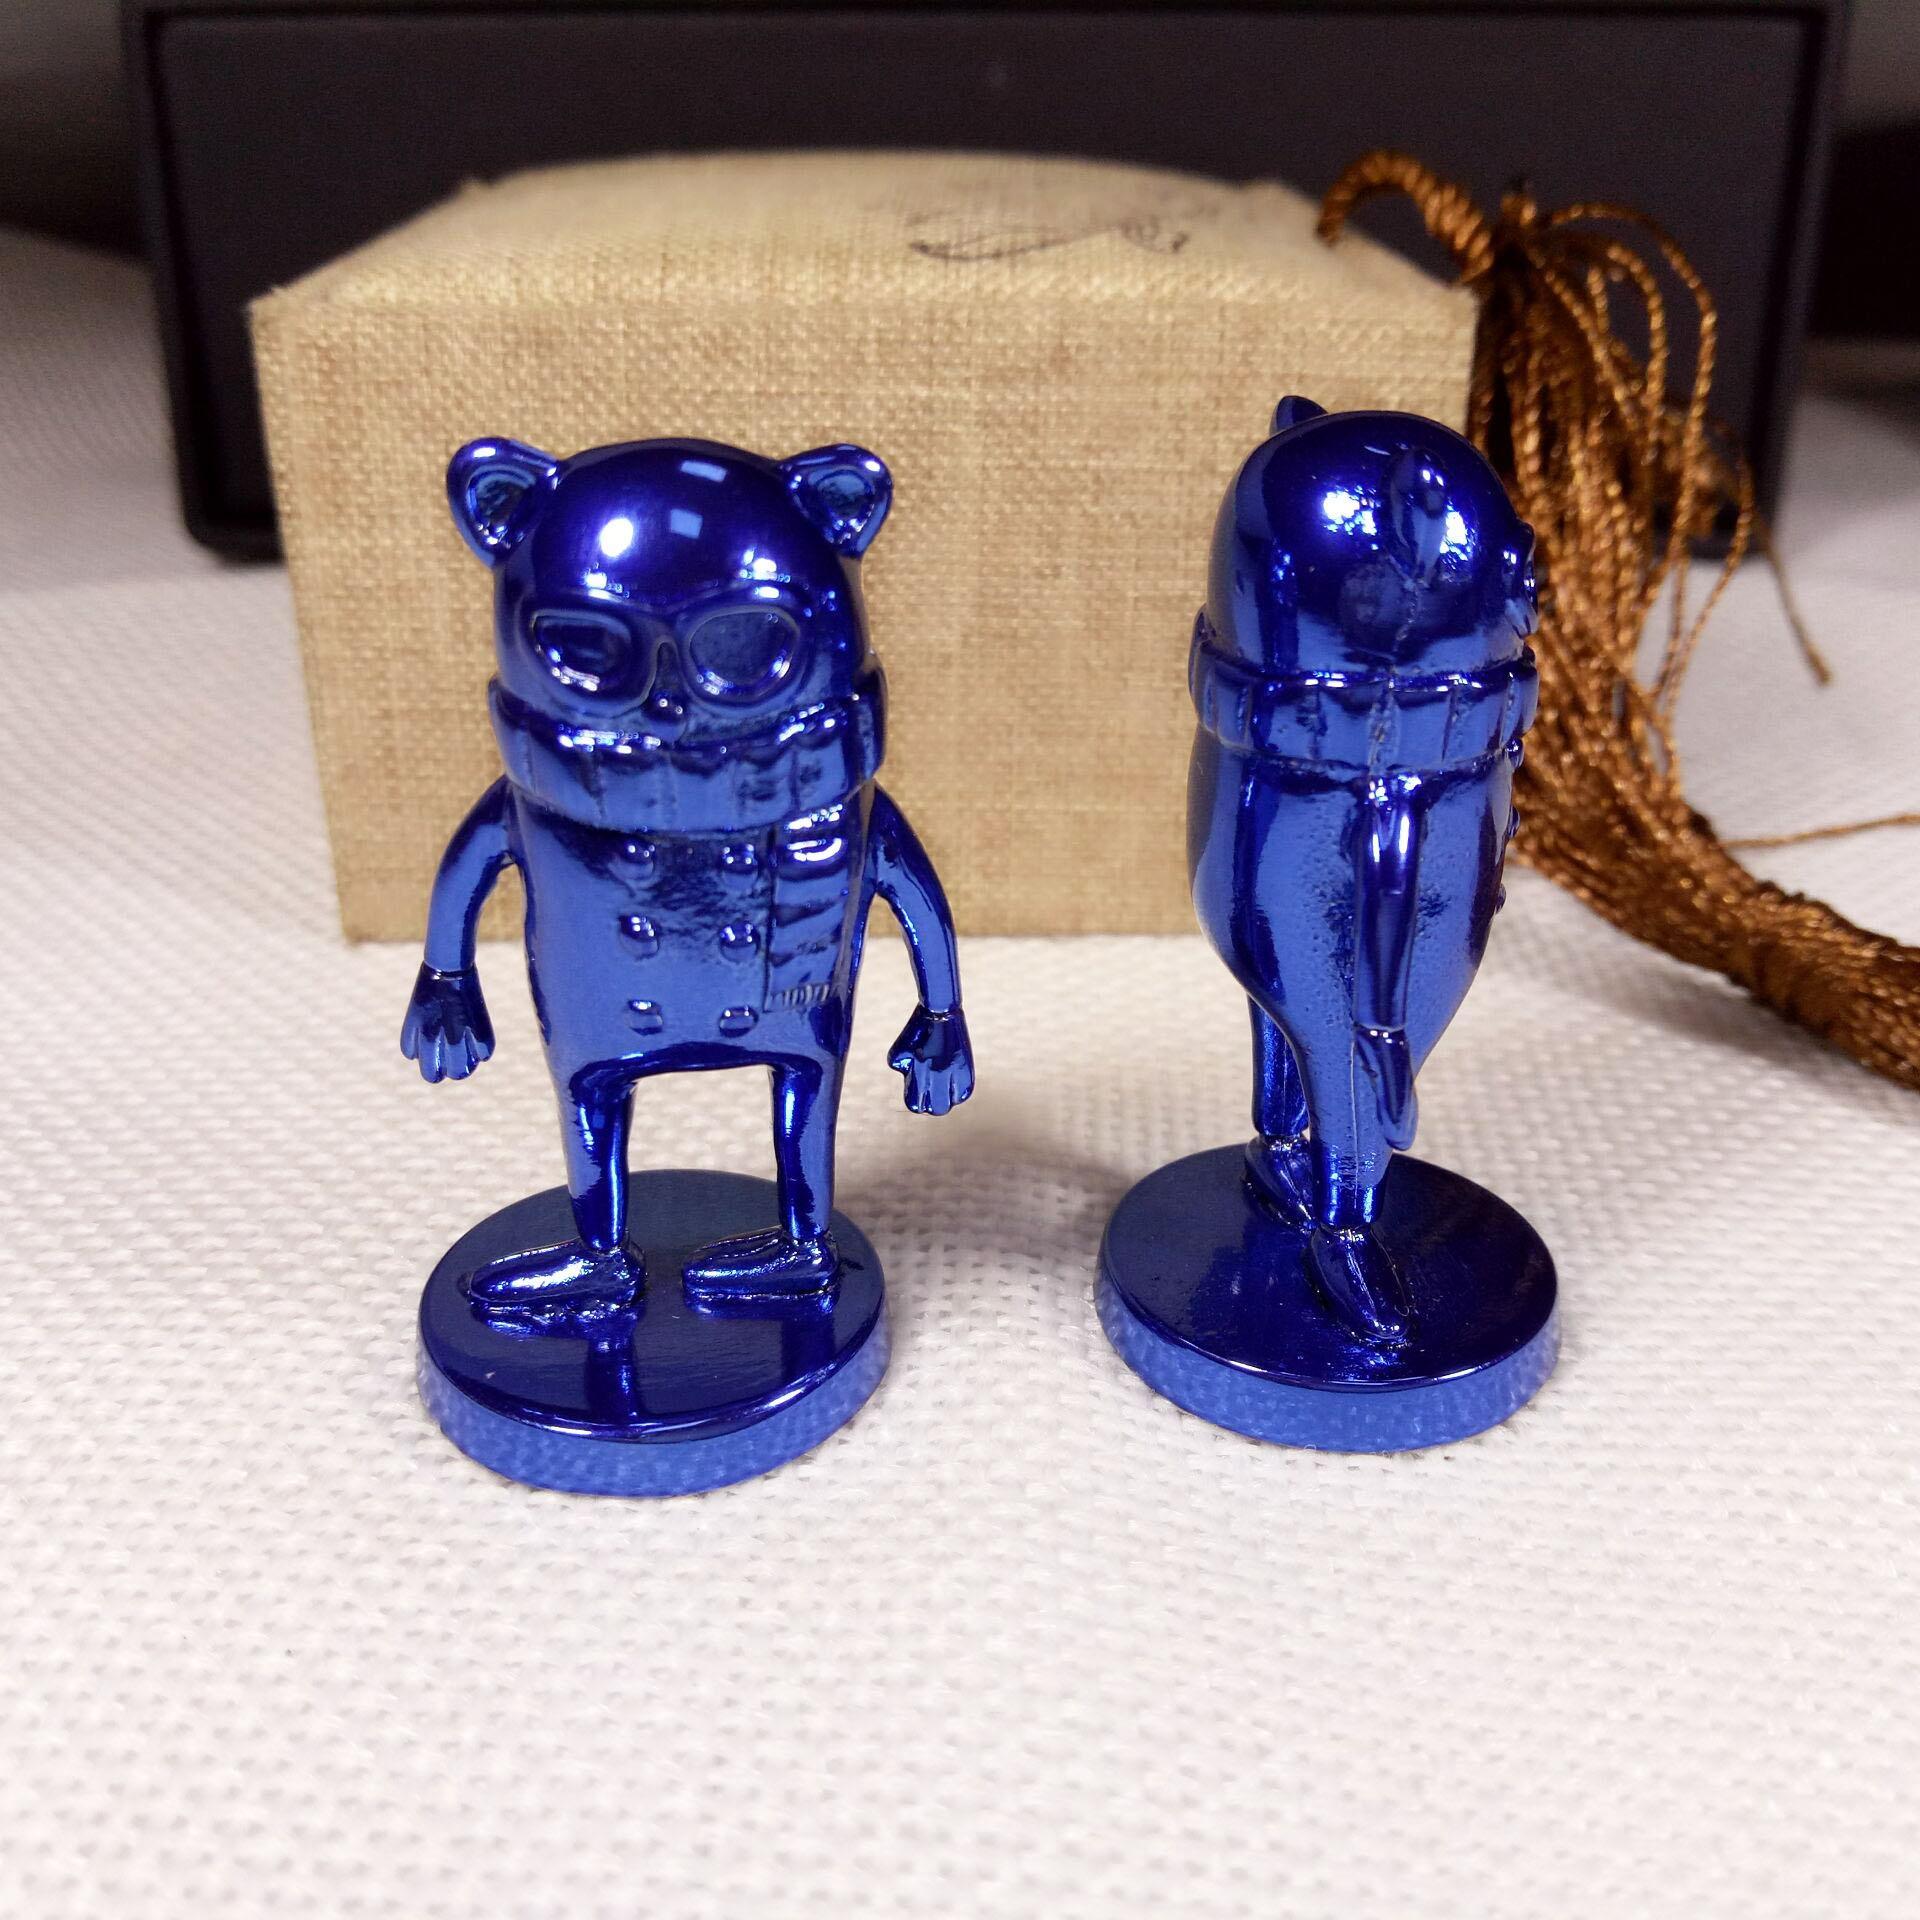 Hot sale zinc alloy custom metal blue plated 3d cartoon figures sculpture for souvenir